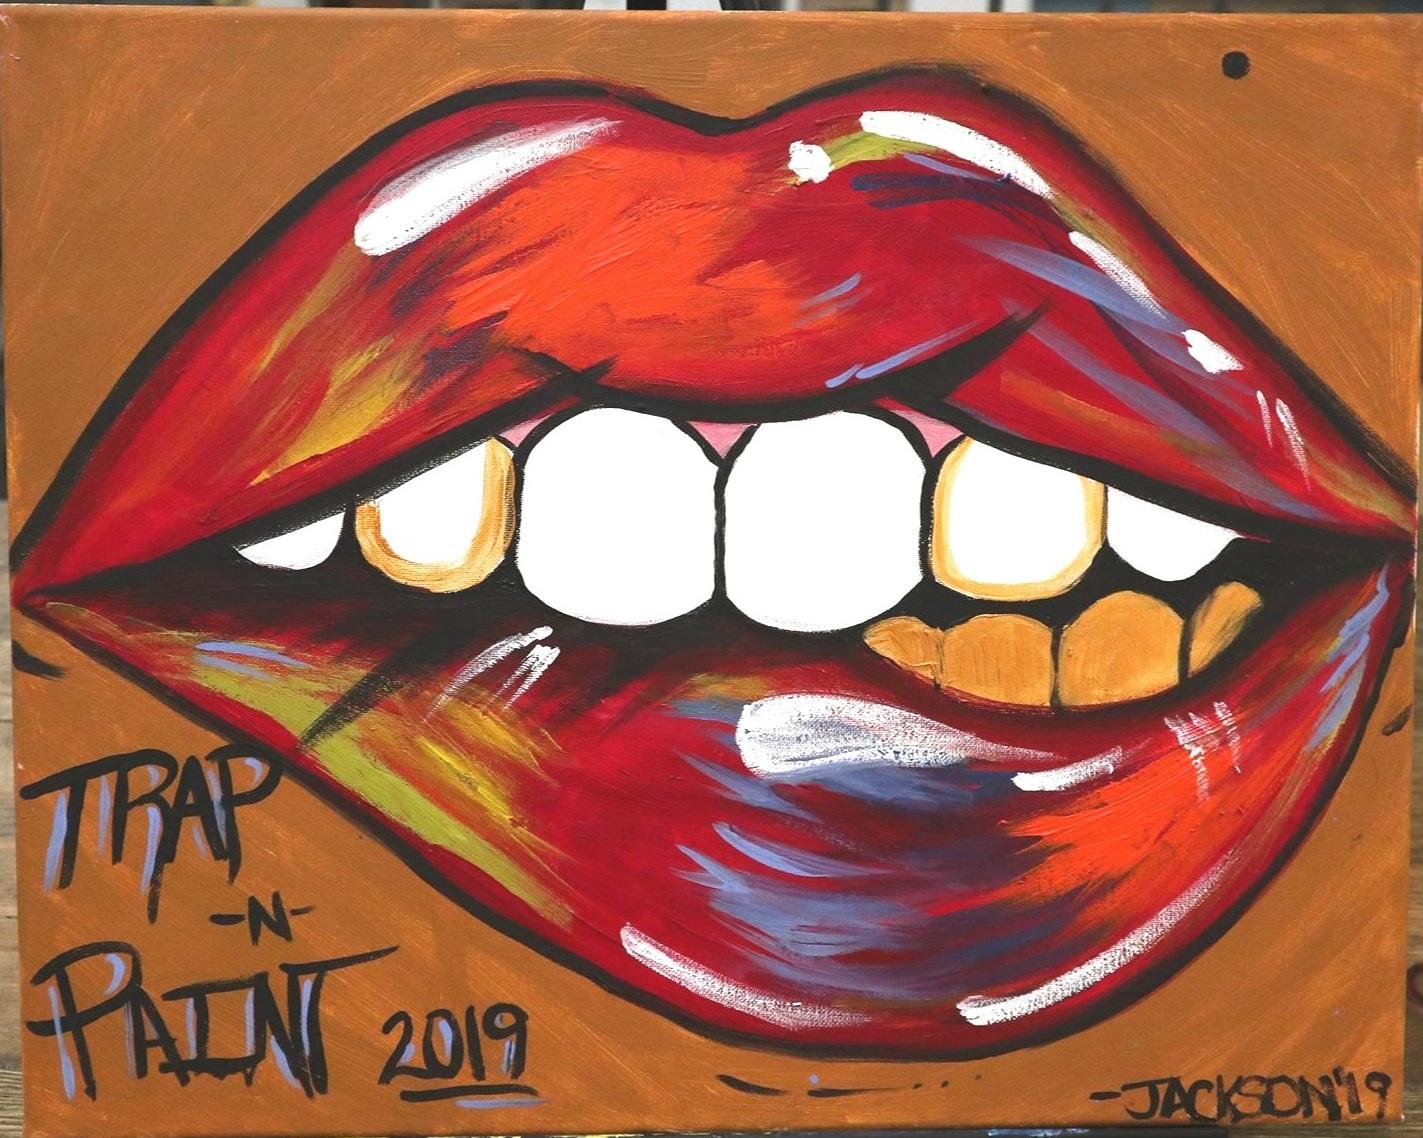 Lip Bite - Jackson